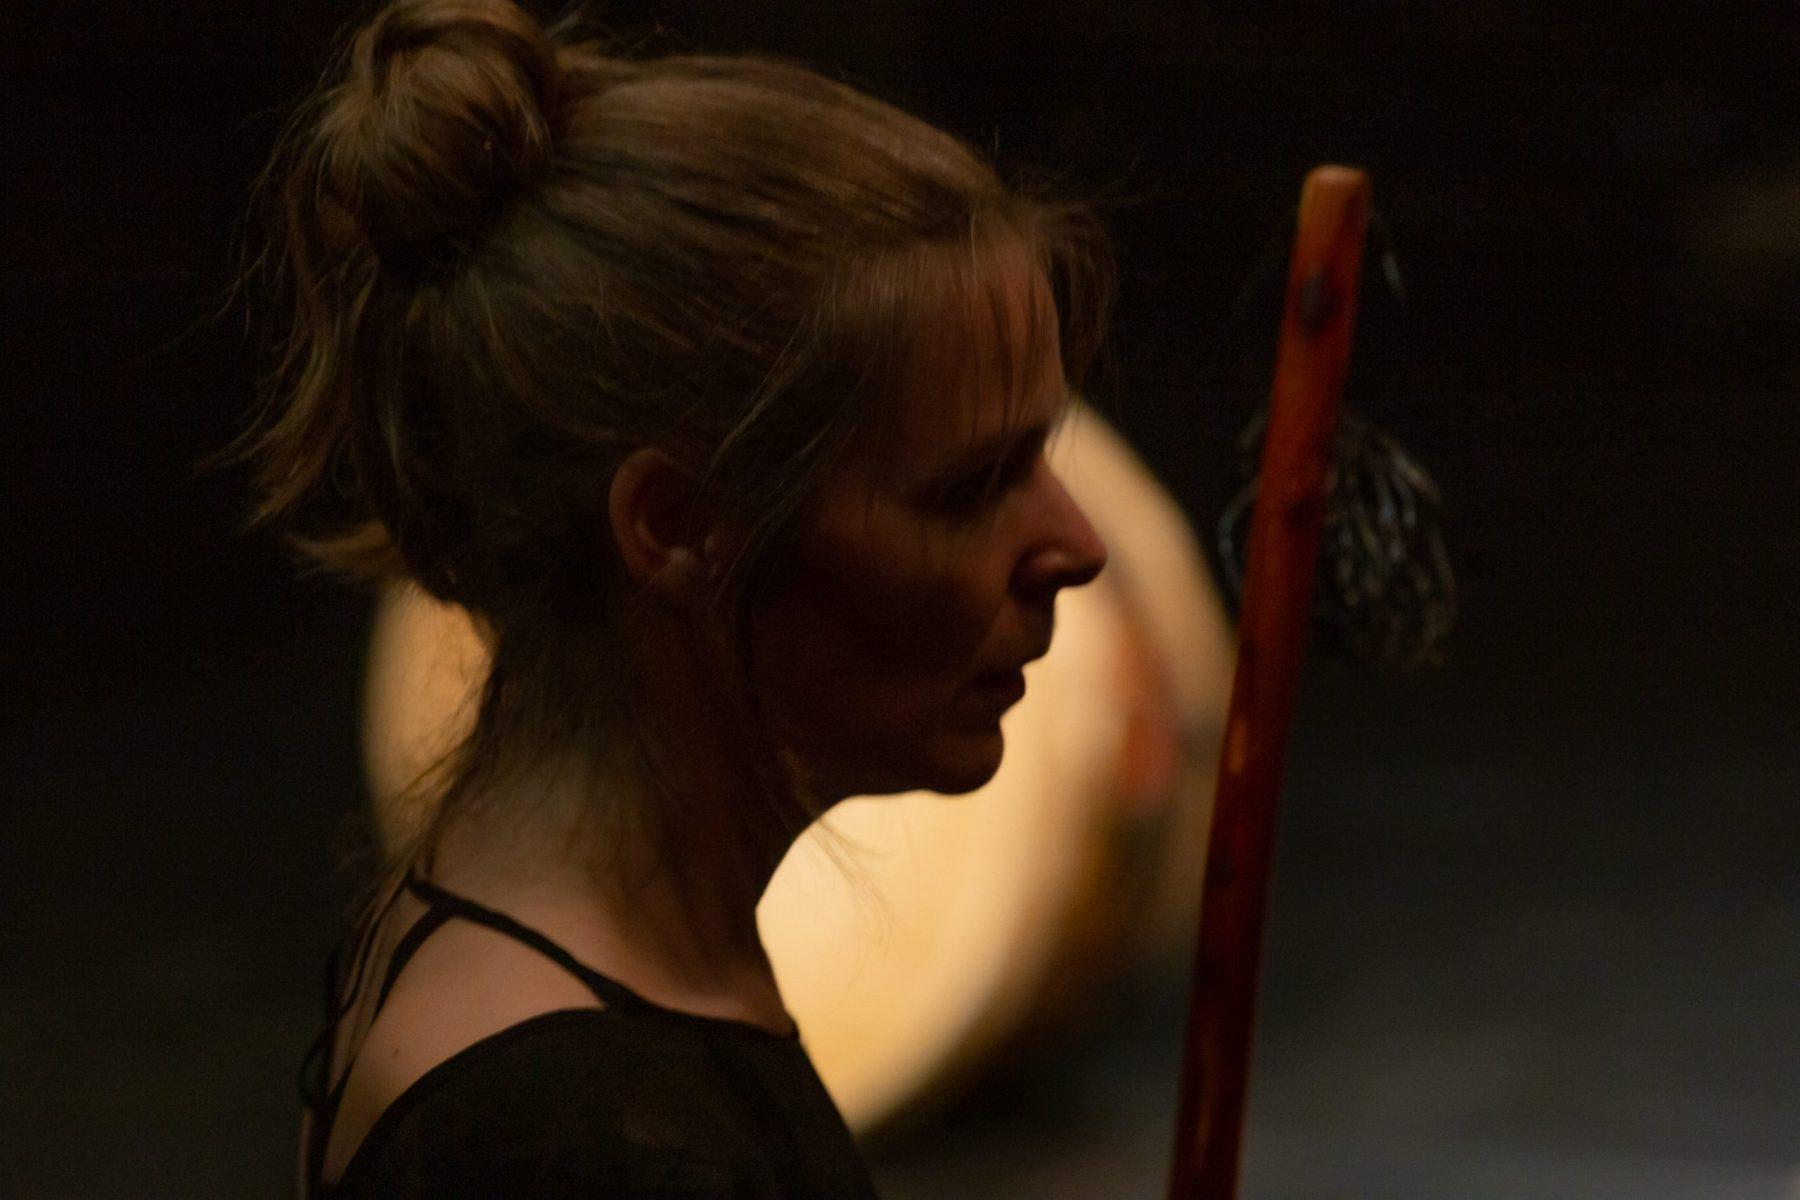 Kersti-profil-close-up-scaled